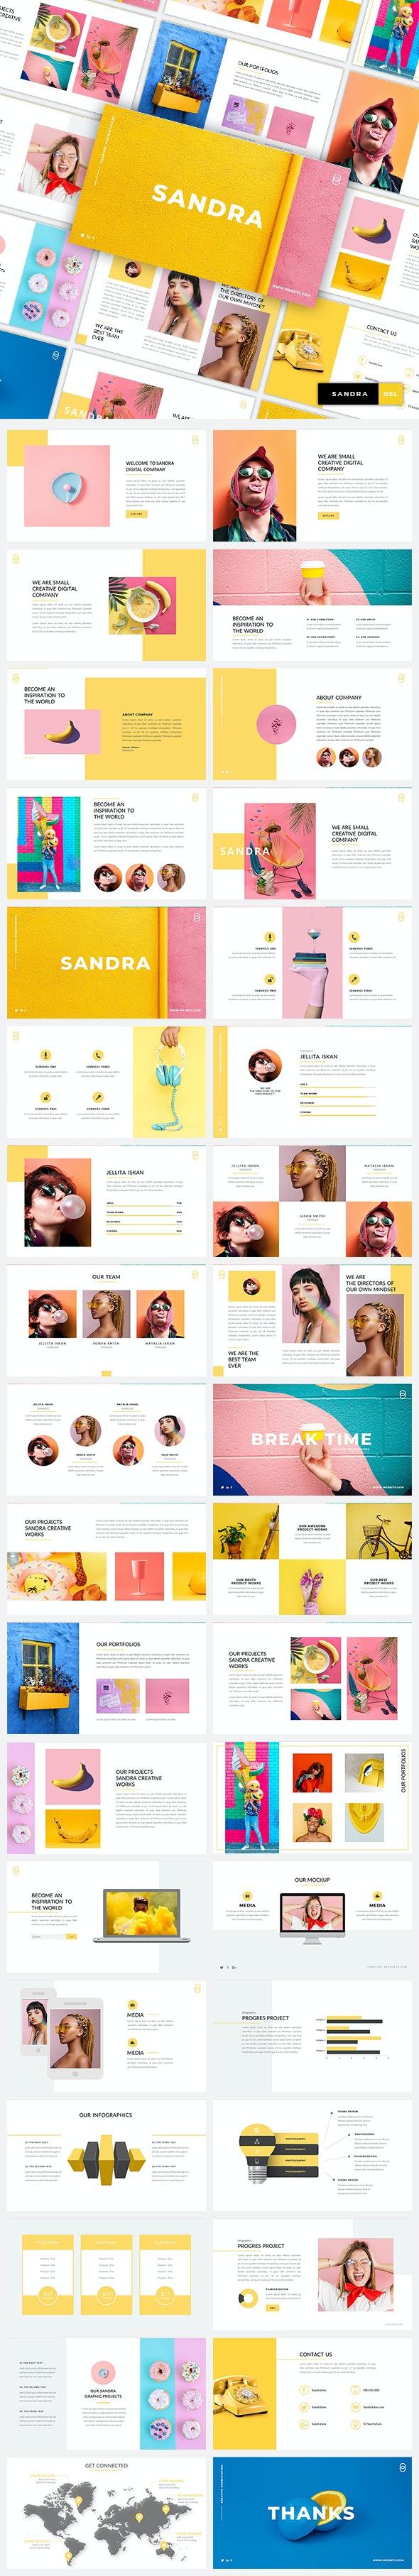 Sandra - Creative & Business GoogleSlide Template - Google Slides Presentation Templates